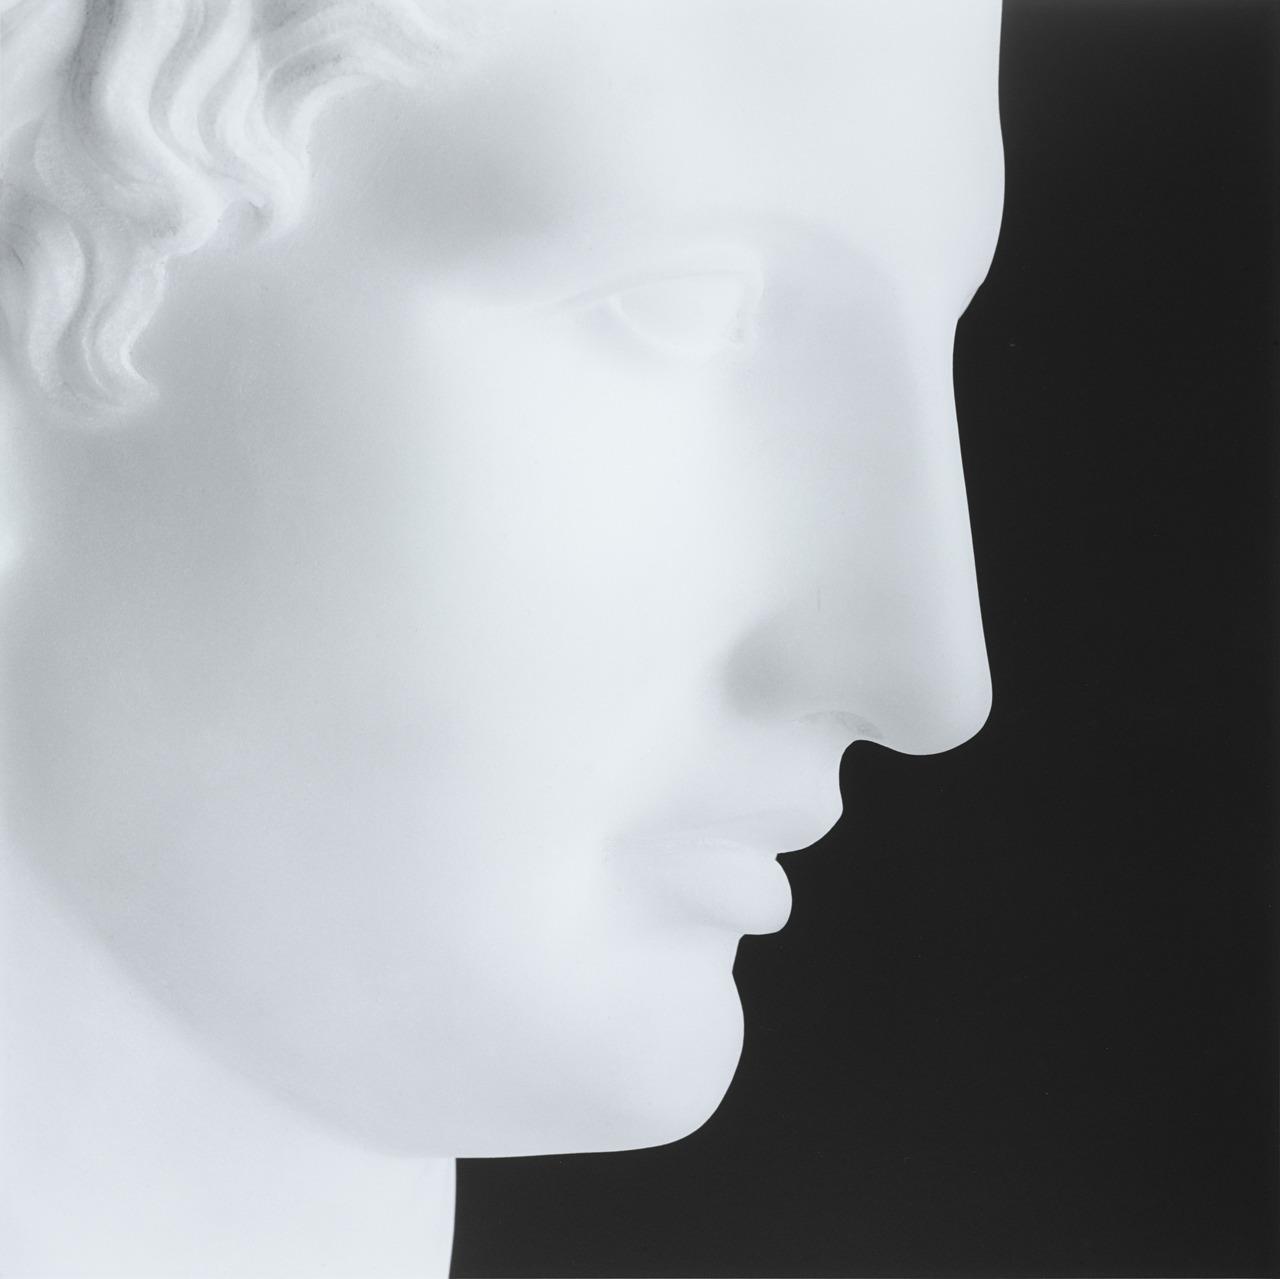 Hermes print Robert Mapplethorpe